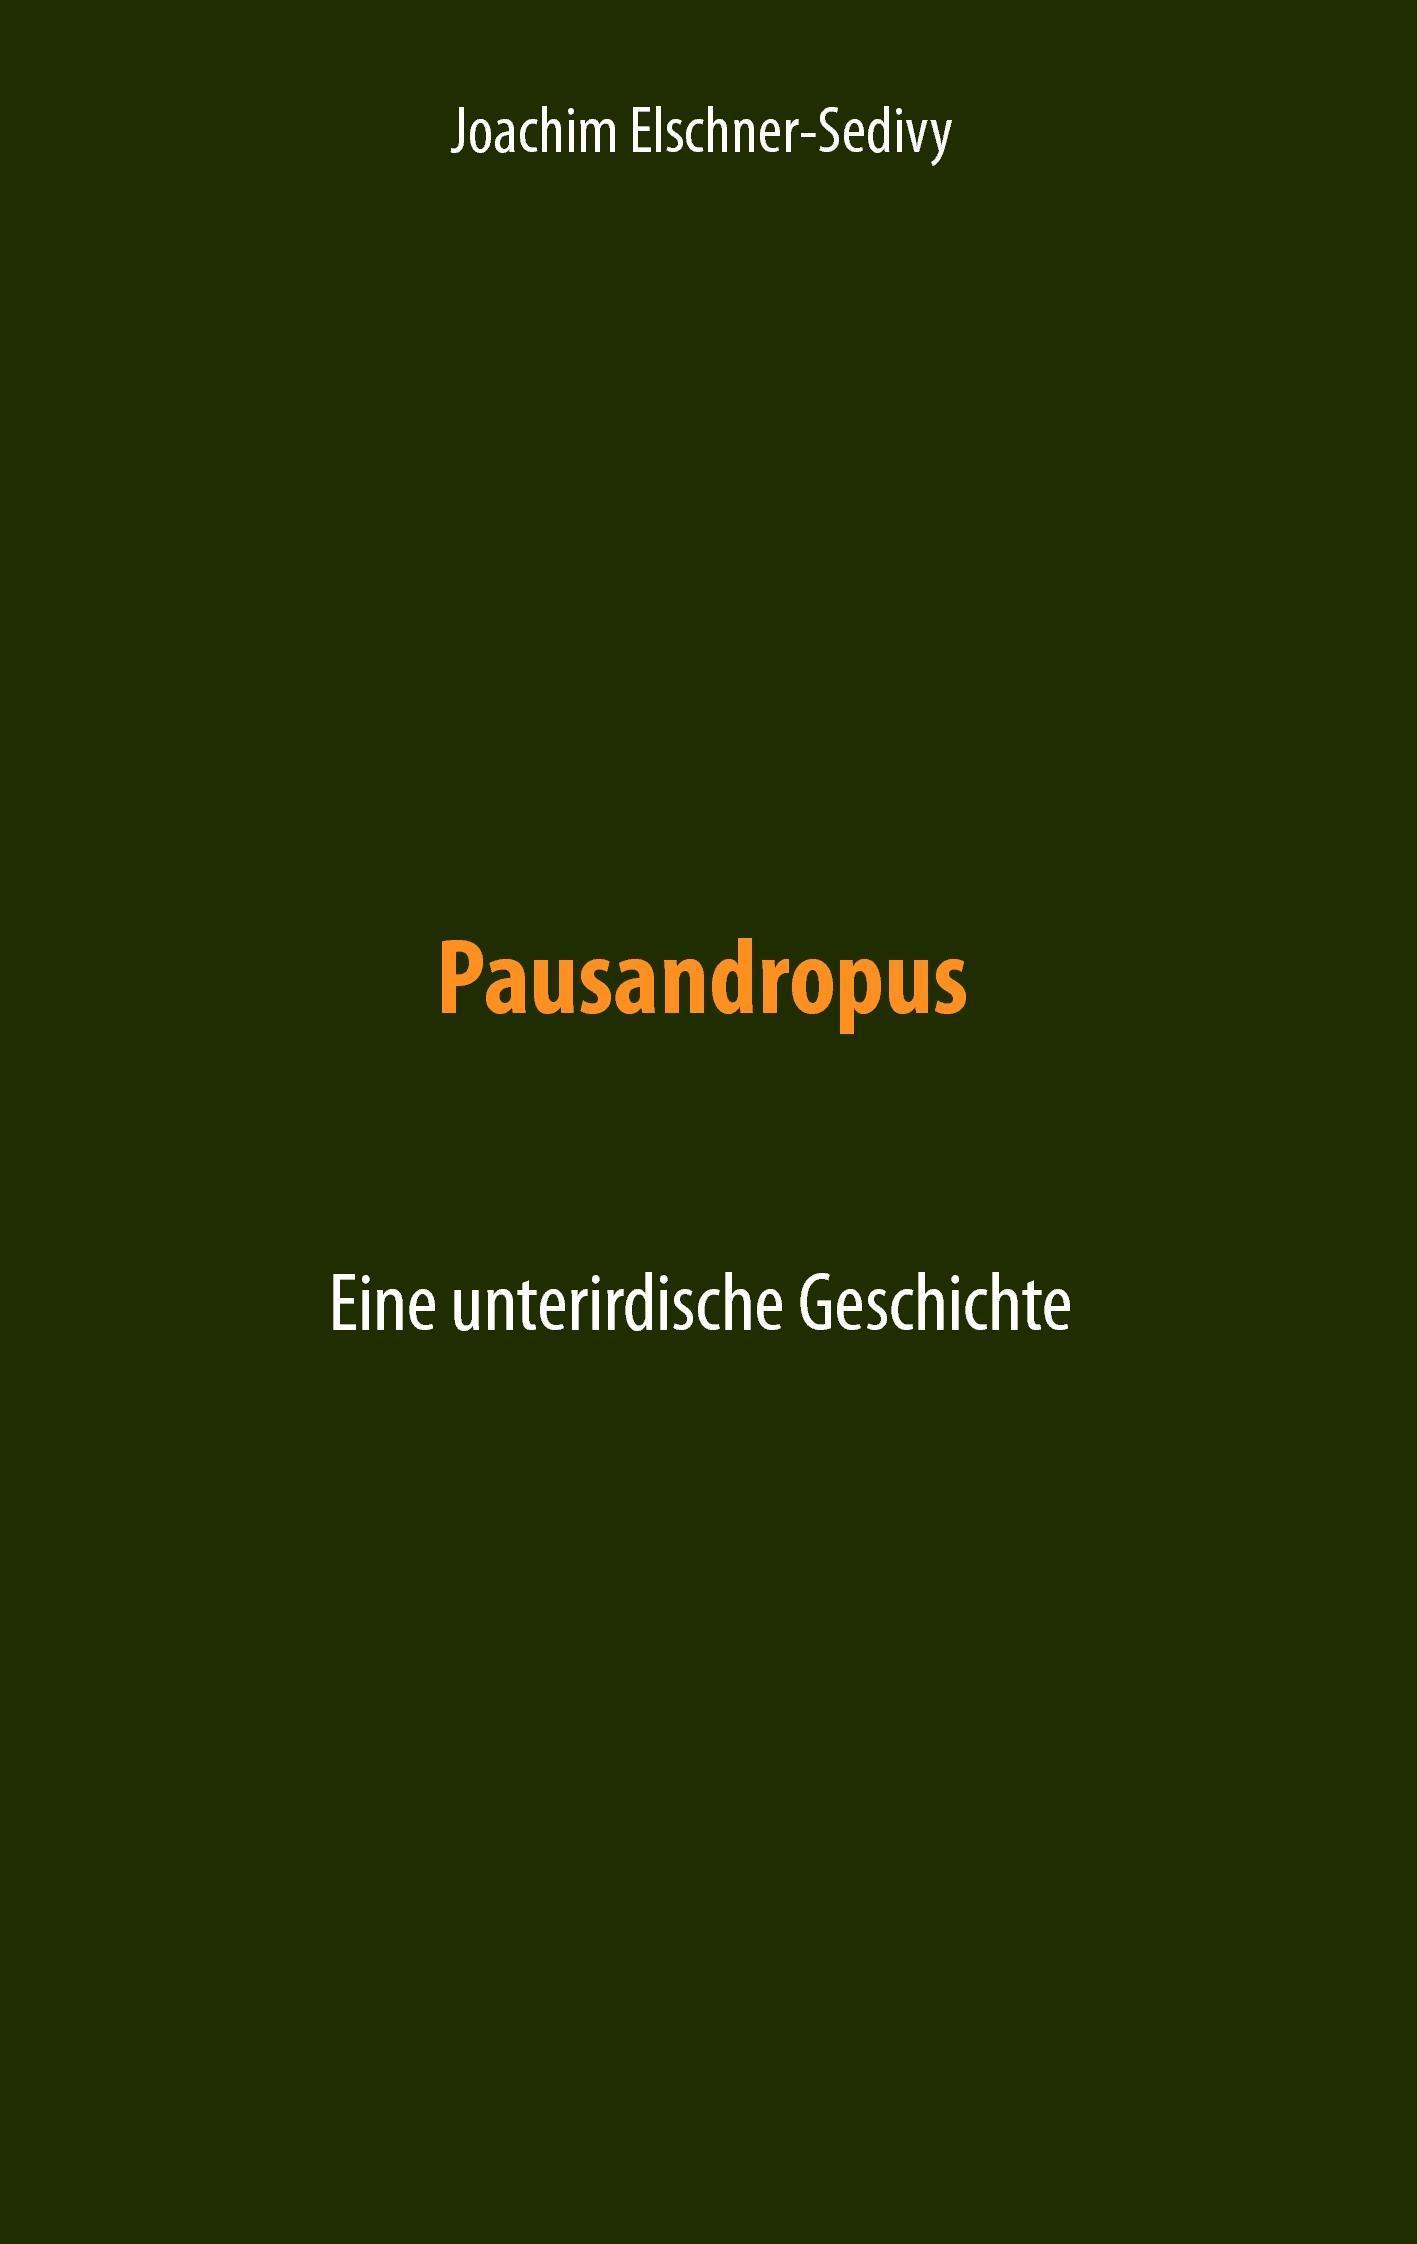 Pausandropus